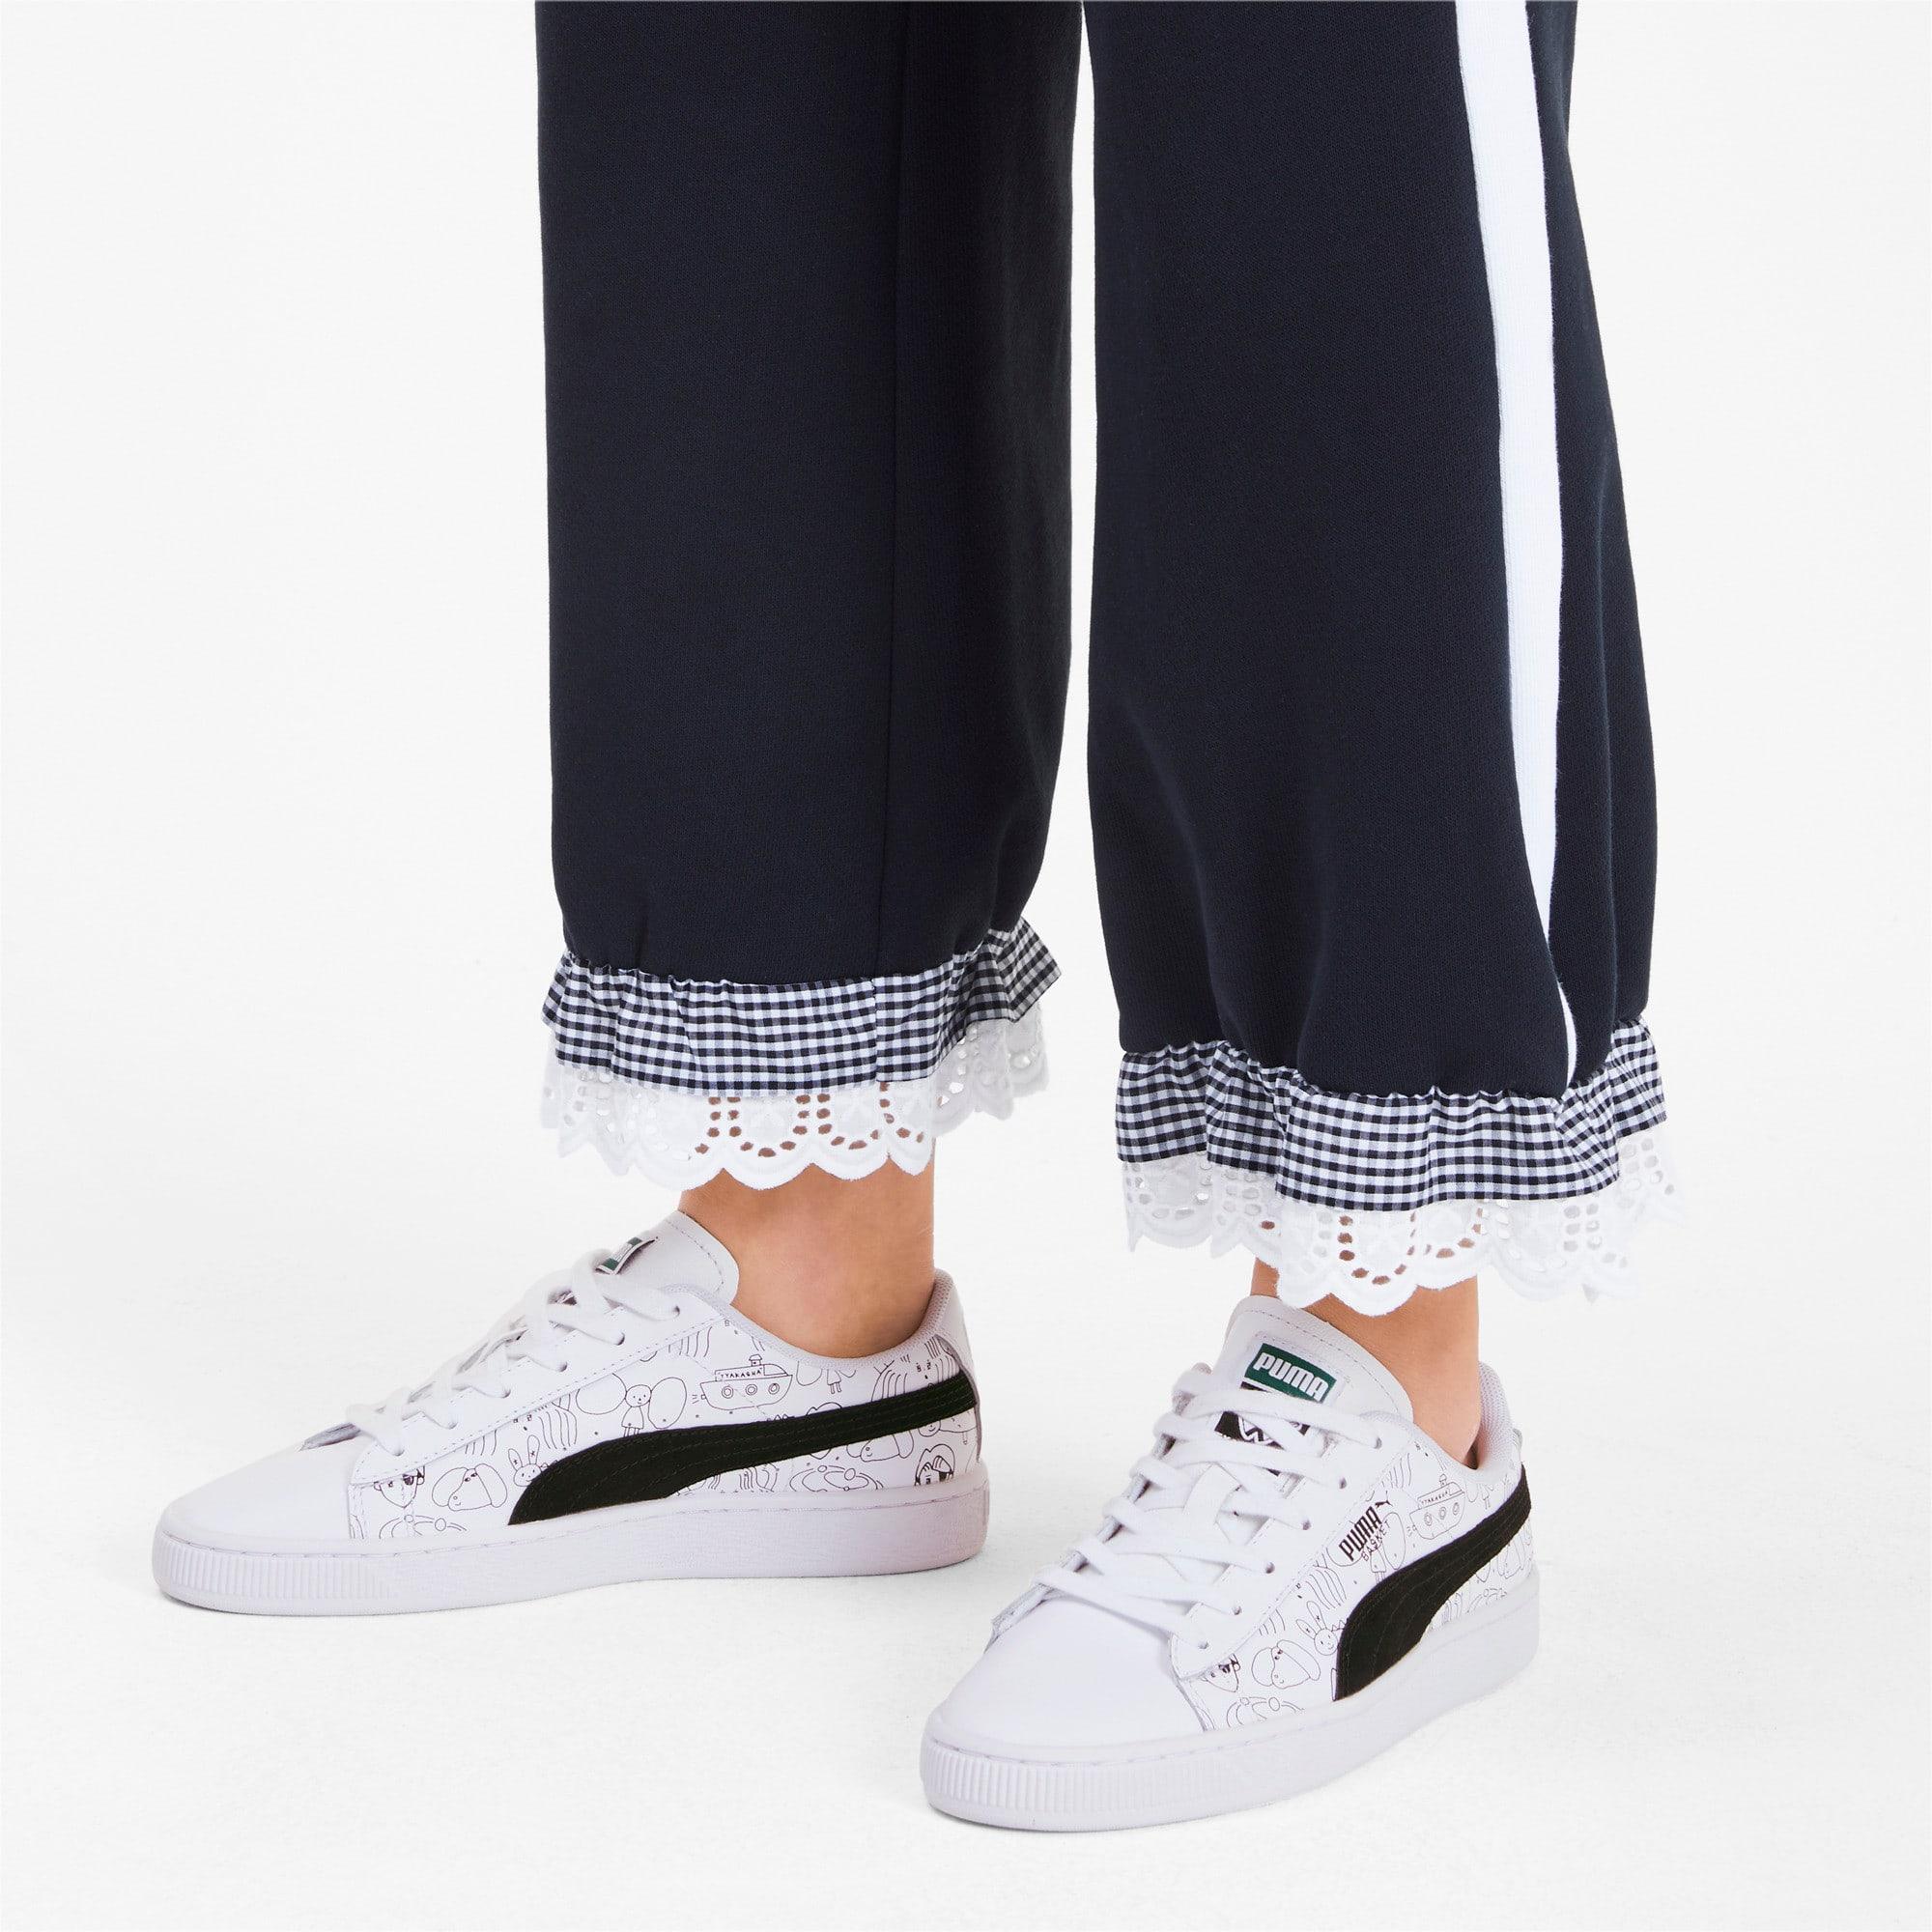 Thumbnail 3 of PUMA x TYAKASHA Basket Sneakers, Puma White-Puma Black, medium